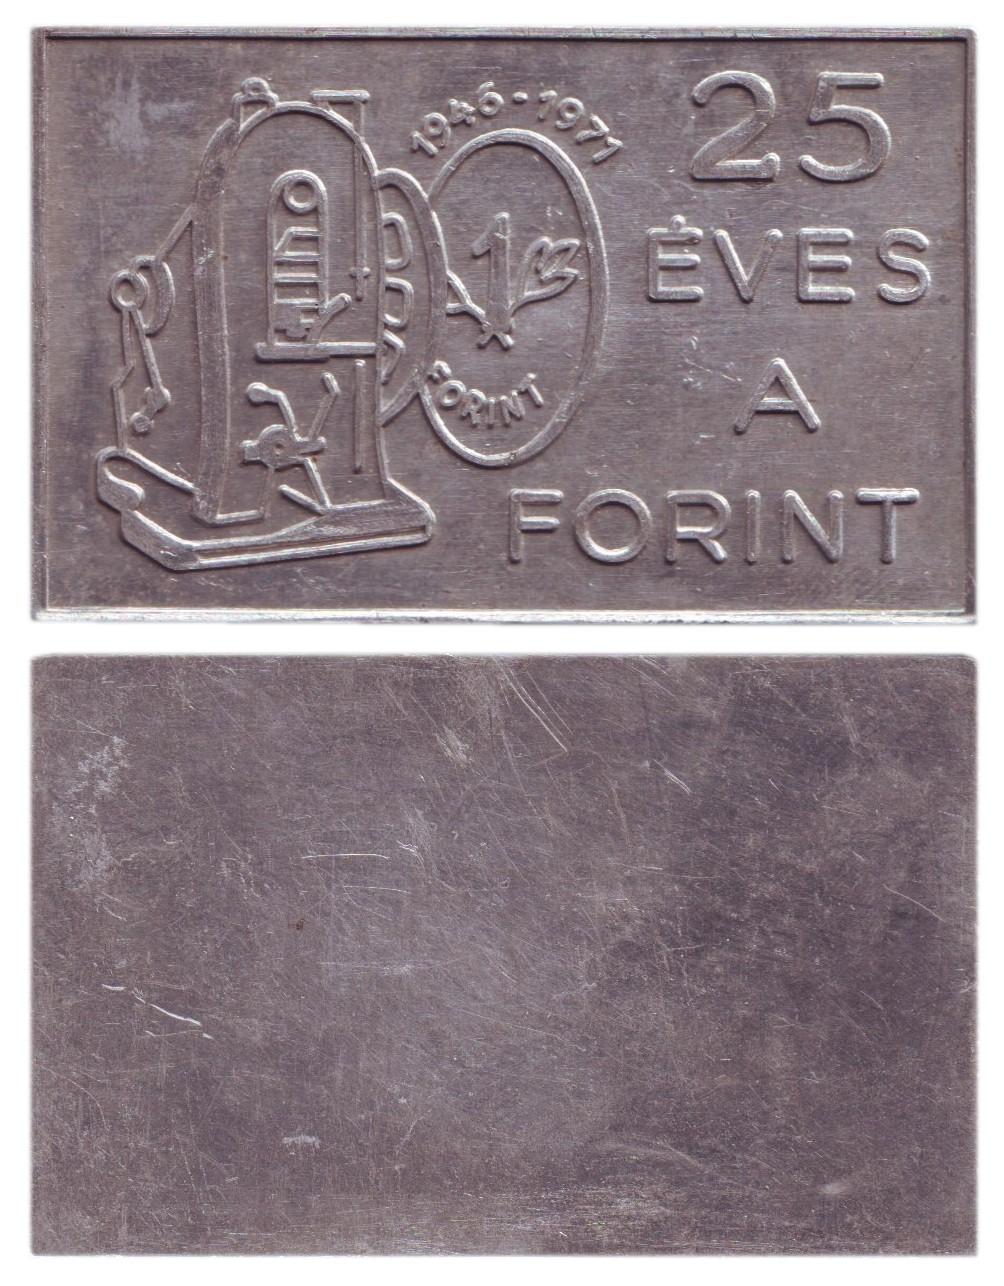 http://www.forintportal.hu/evfordulok/www_forintportal_hu_25eves_a_forint_aluminium_lap_nagy.jpg